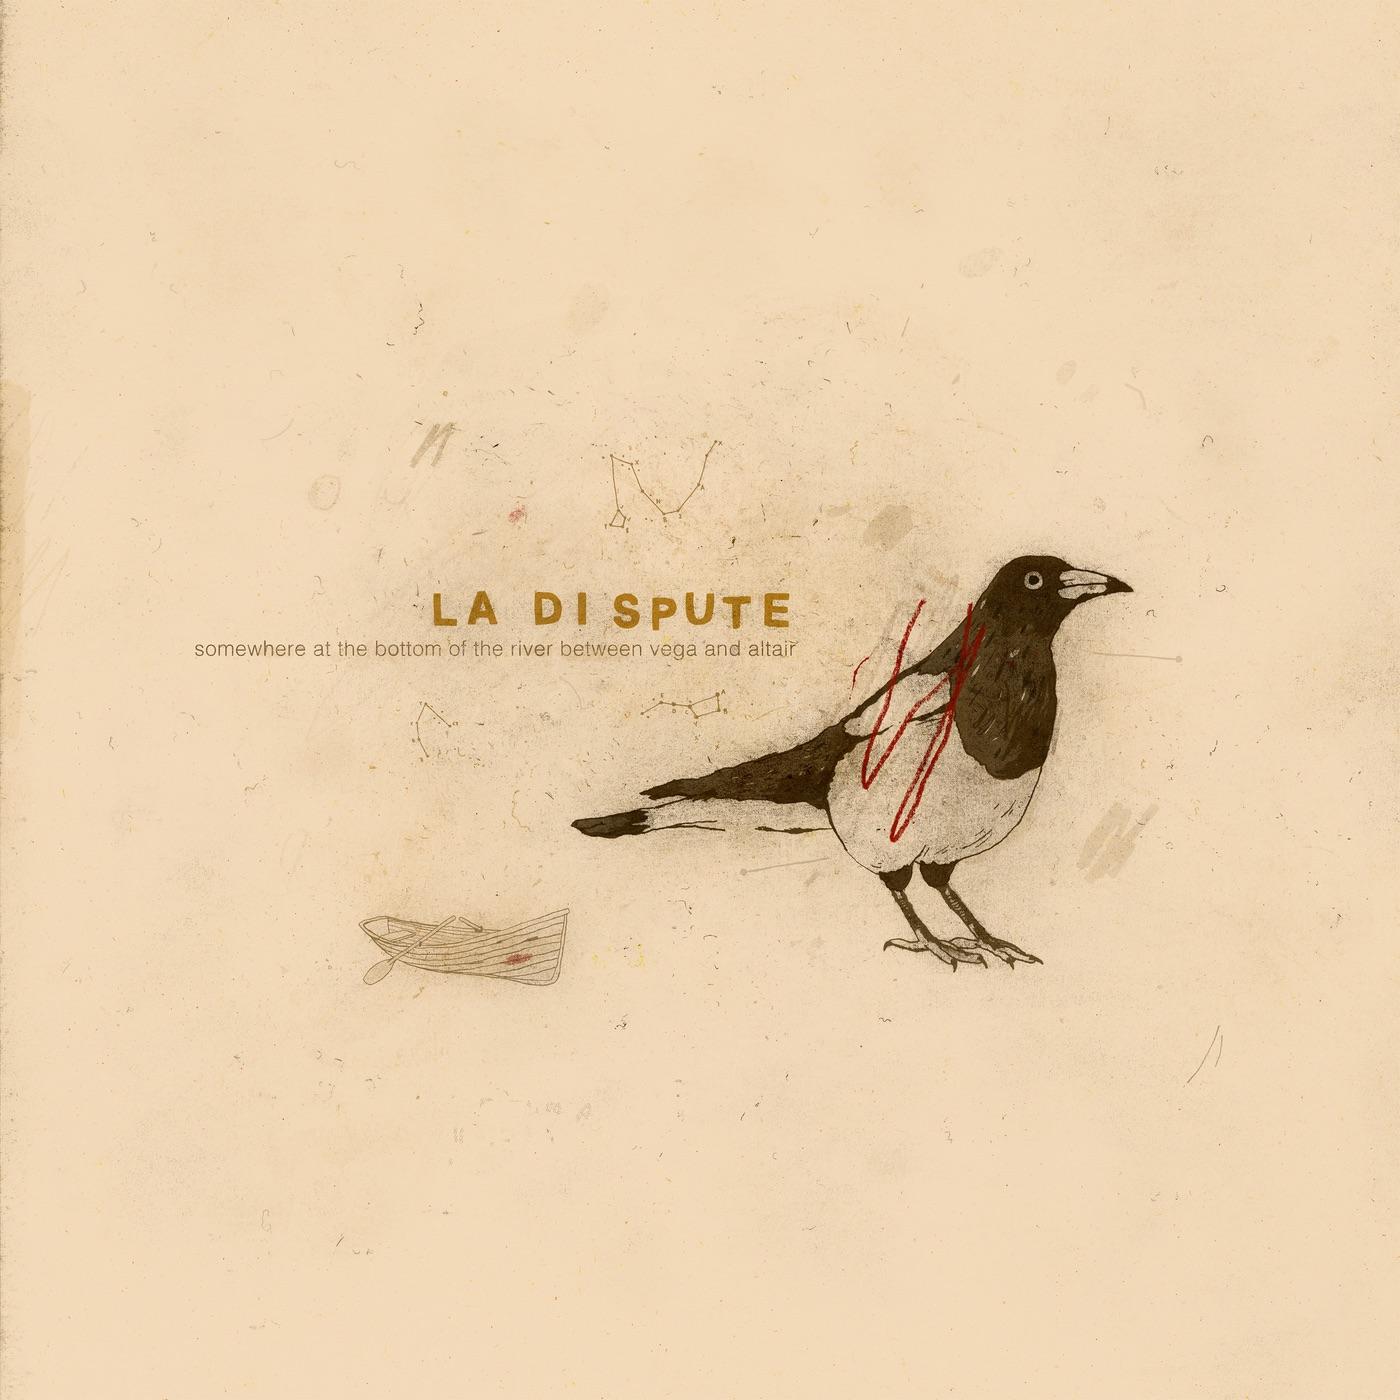 La Dispute - The Castle Builders [single] (2018)